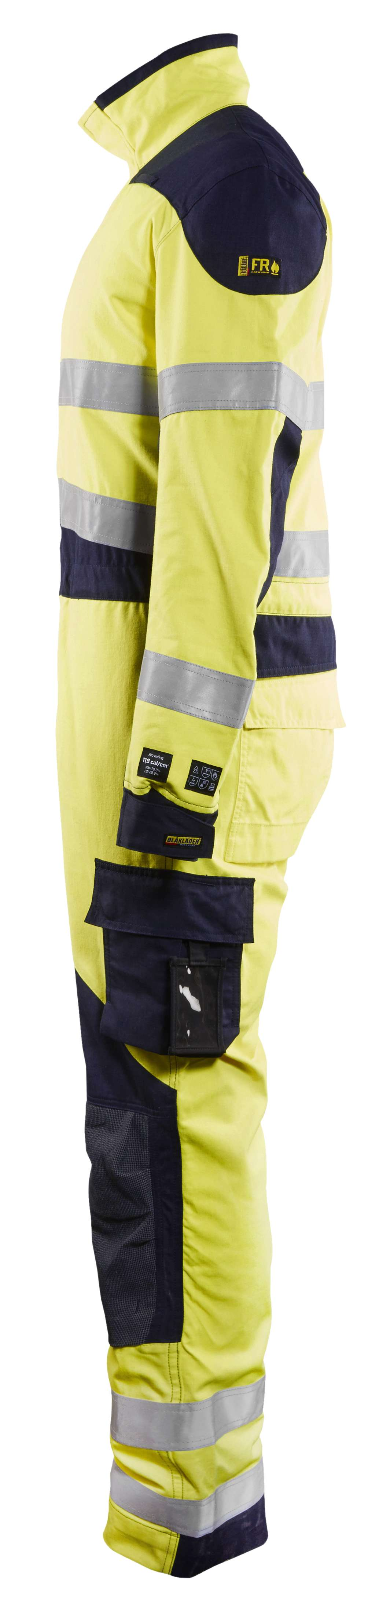 Blaklader Overalls 60891512 Multinorm geel-marineblauw(3389)